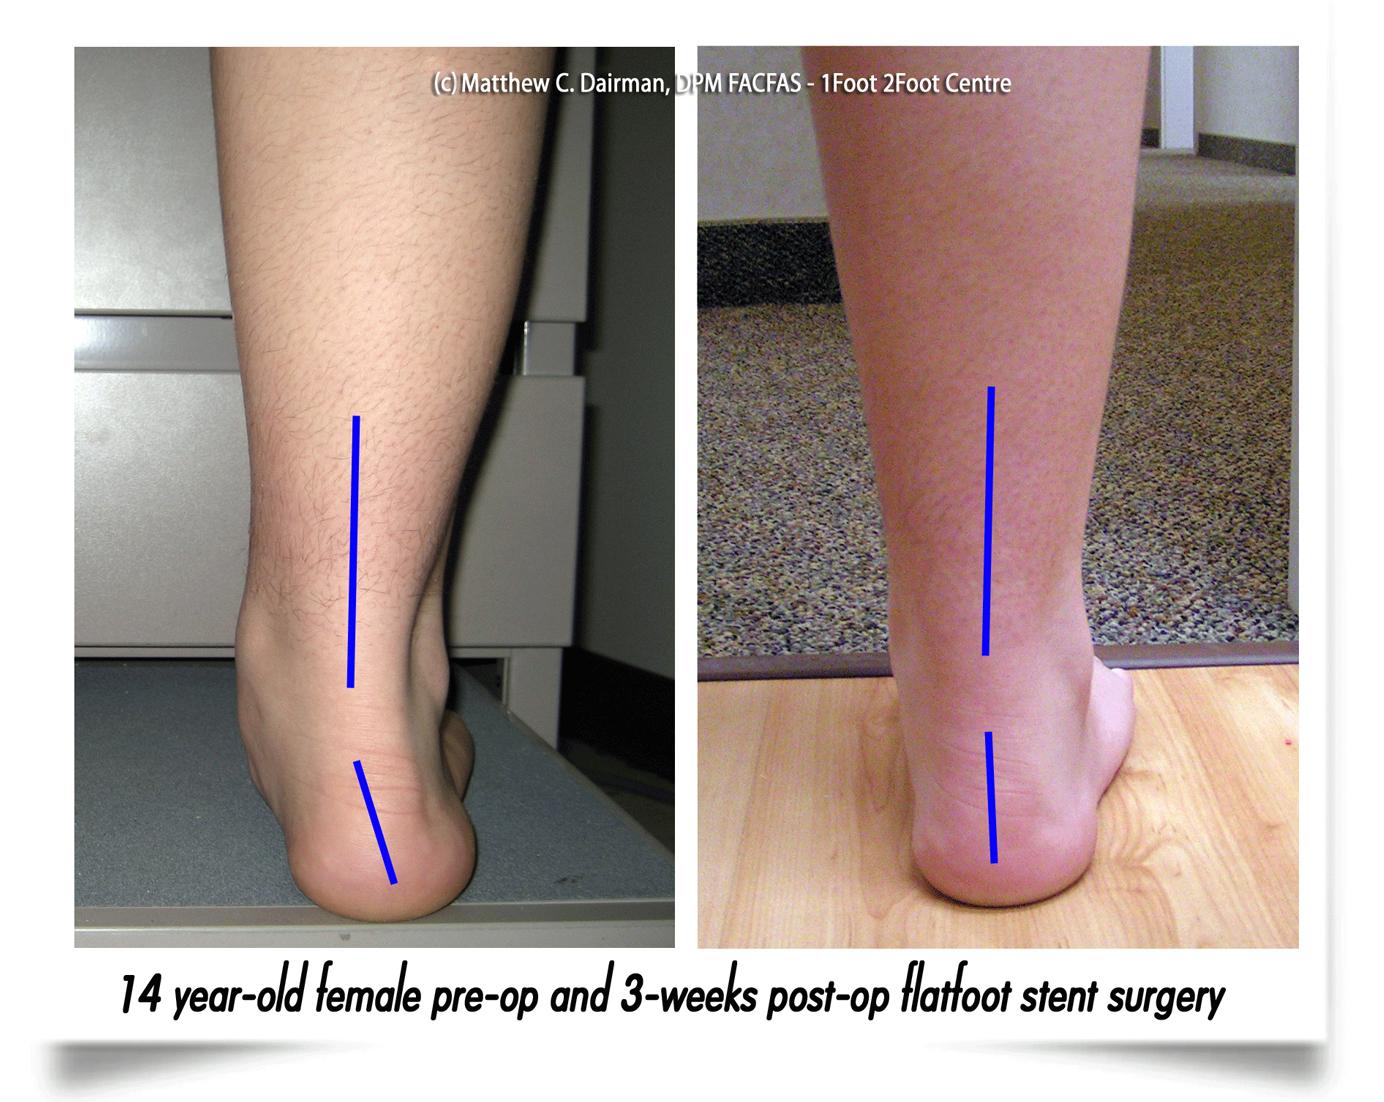 suffolk foot-doctors for flat feet